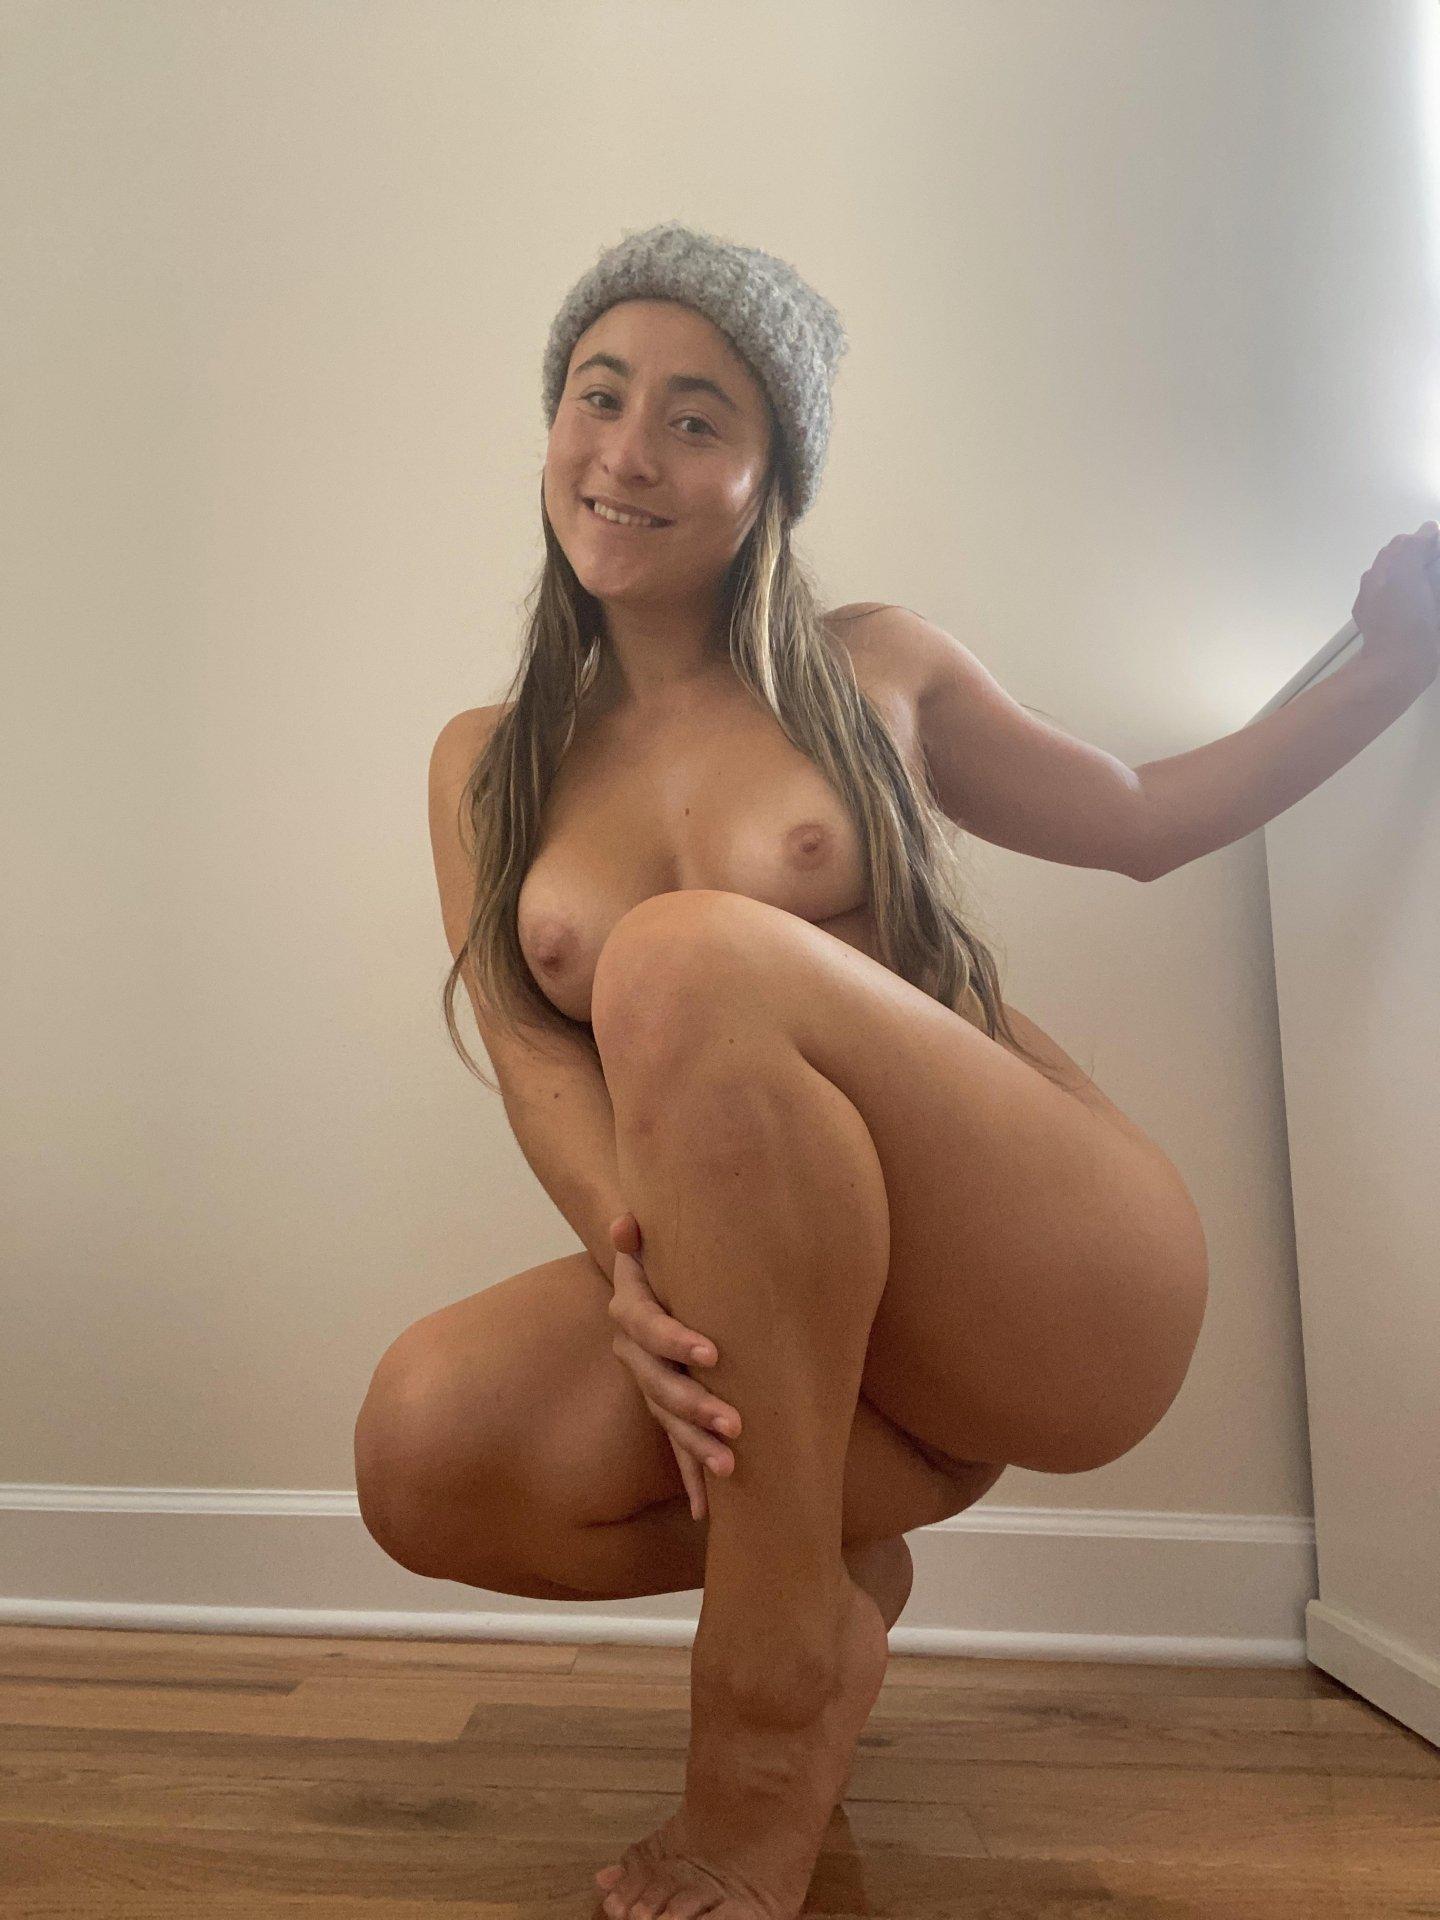 QueenAliya from Poole,United Kingdom